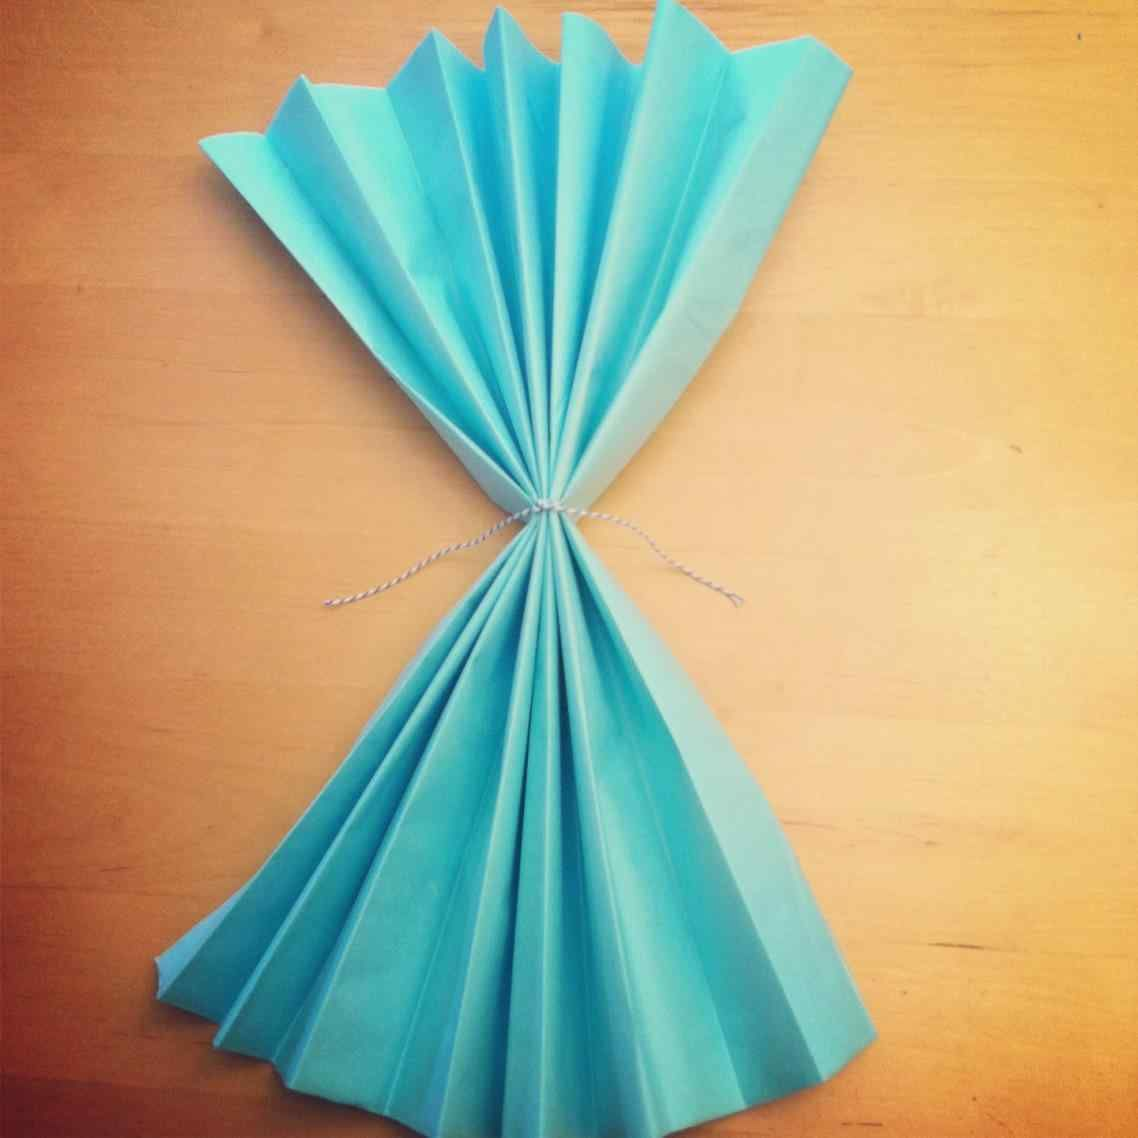 Pin by Fults Michele on Decors212 Pinterest Paper mache pinata